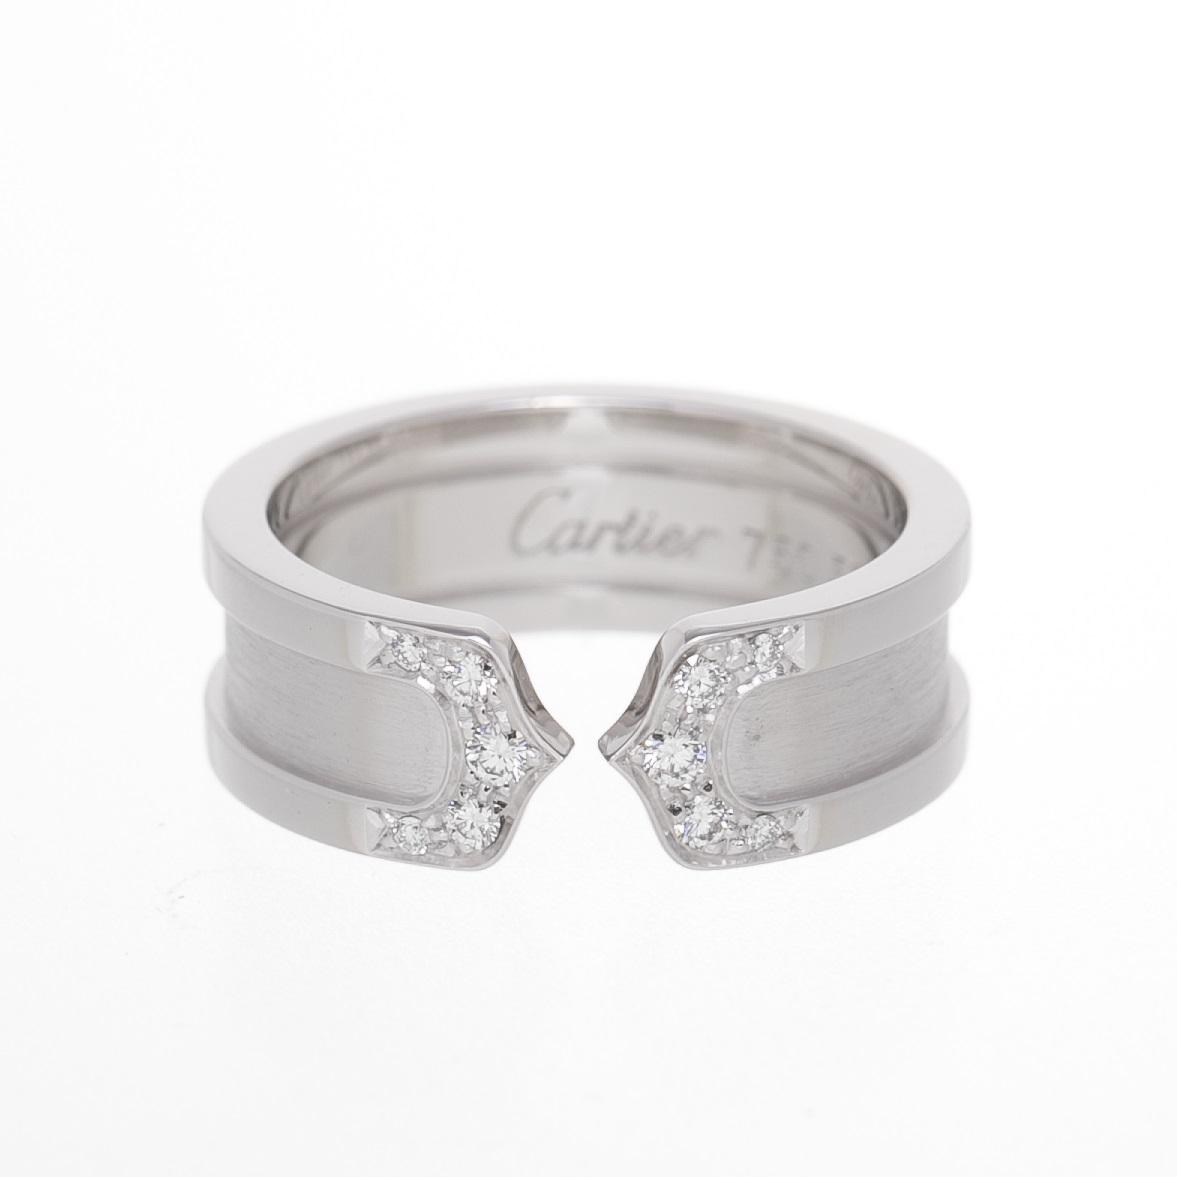 Cartier カルティエ C2ダイヤリング 指輪 750WG #50 新品同様品 送料無料 【トレジャースポット】【中古】